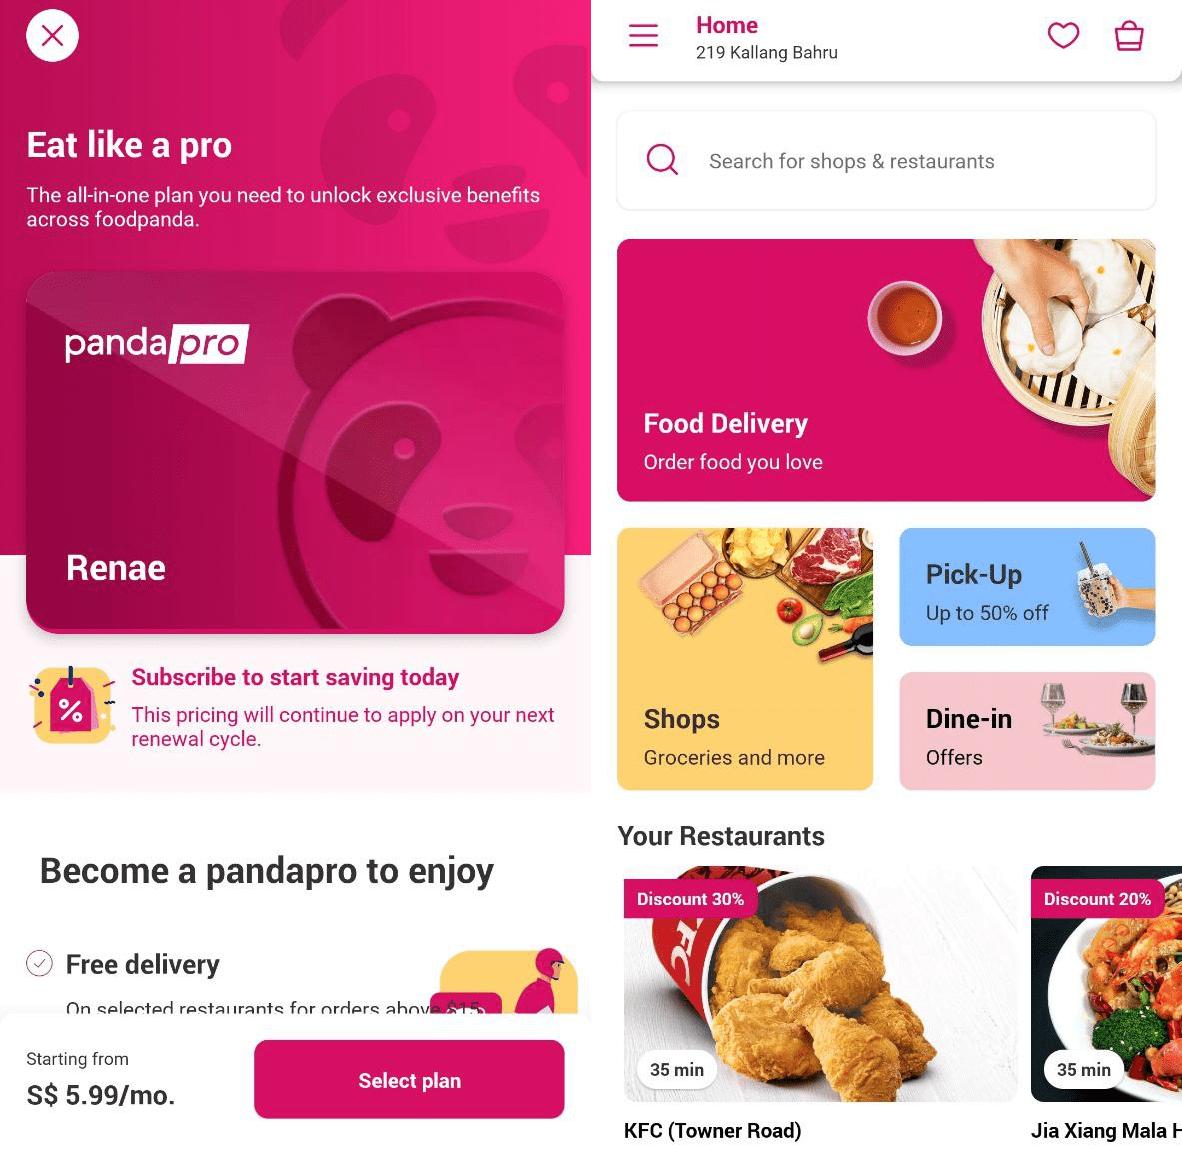 foodpanda hacks - pandapro subscription